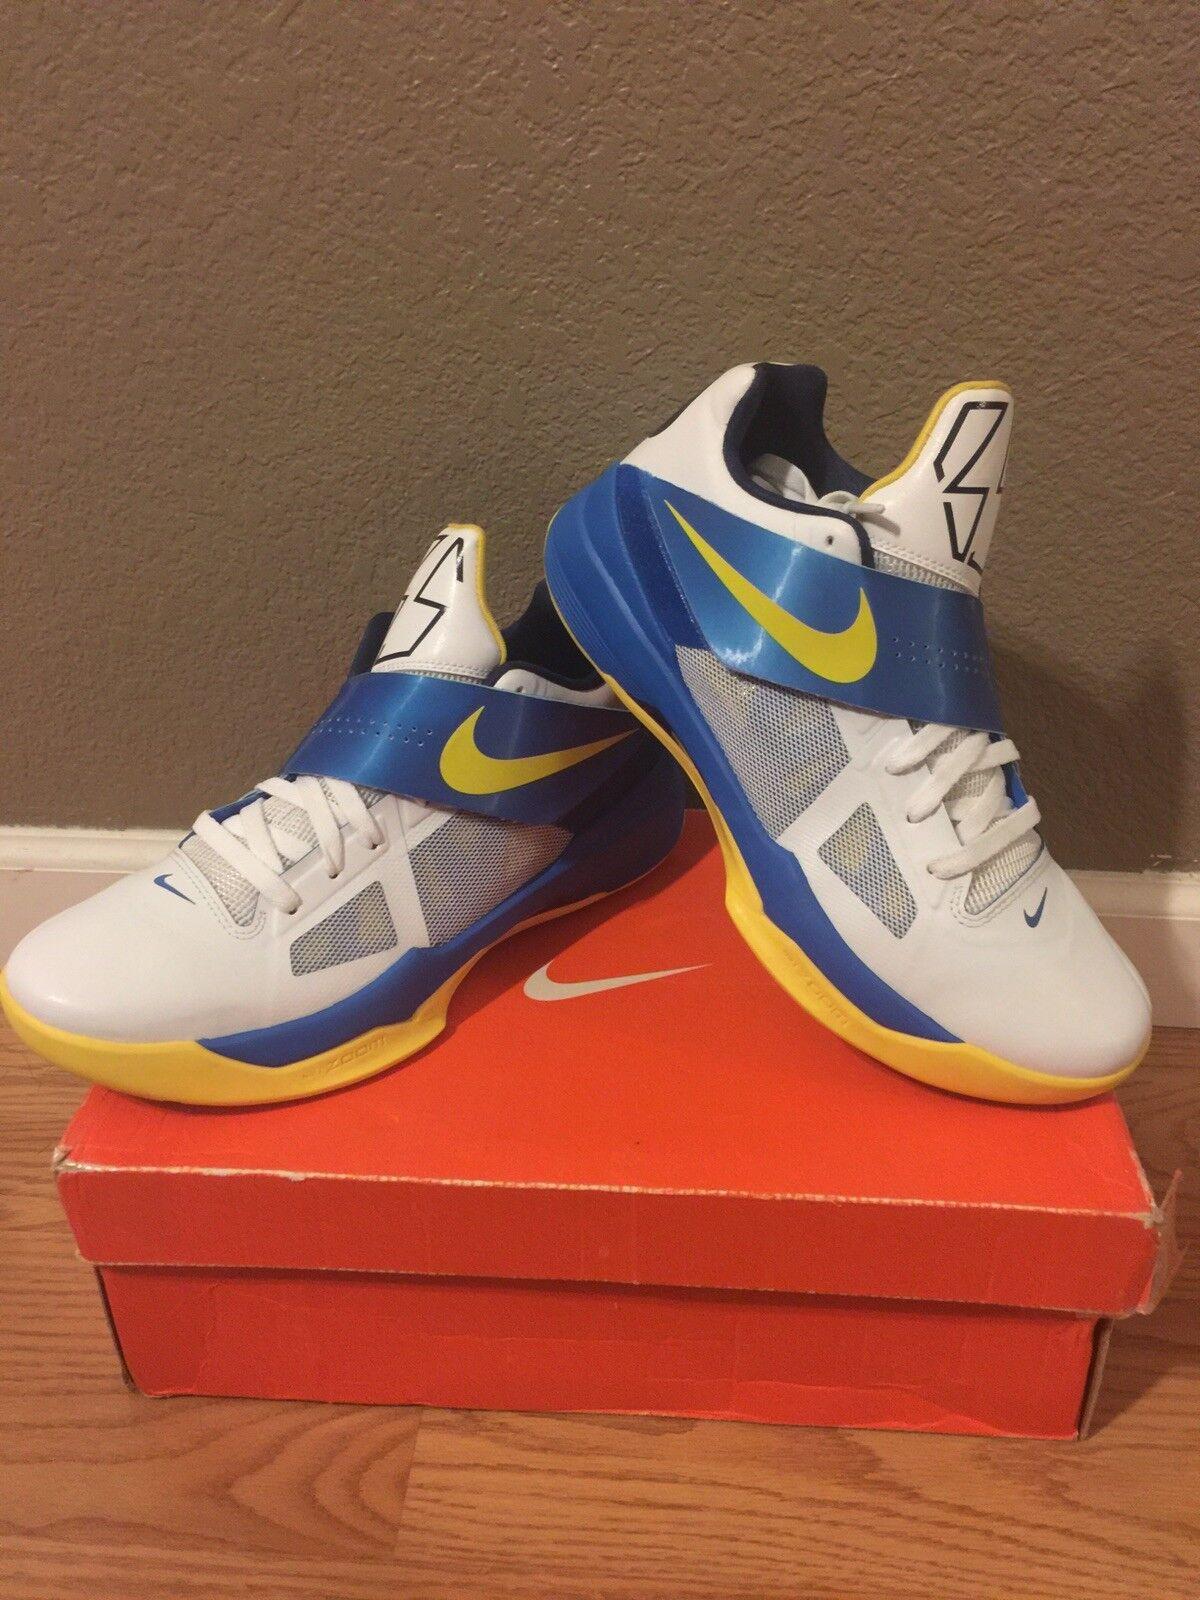 Nike kd 4 4 4 iv kevin durant e scarpe da basket 86d097